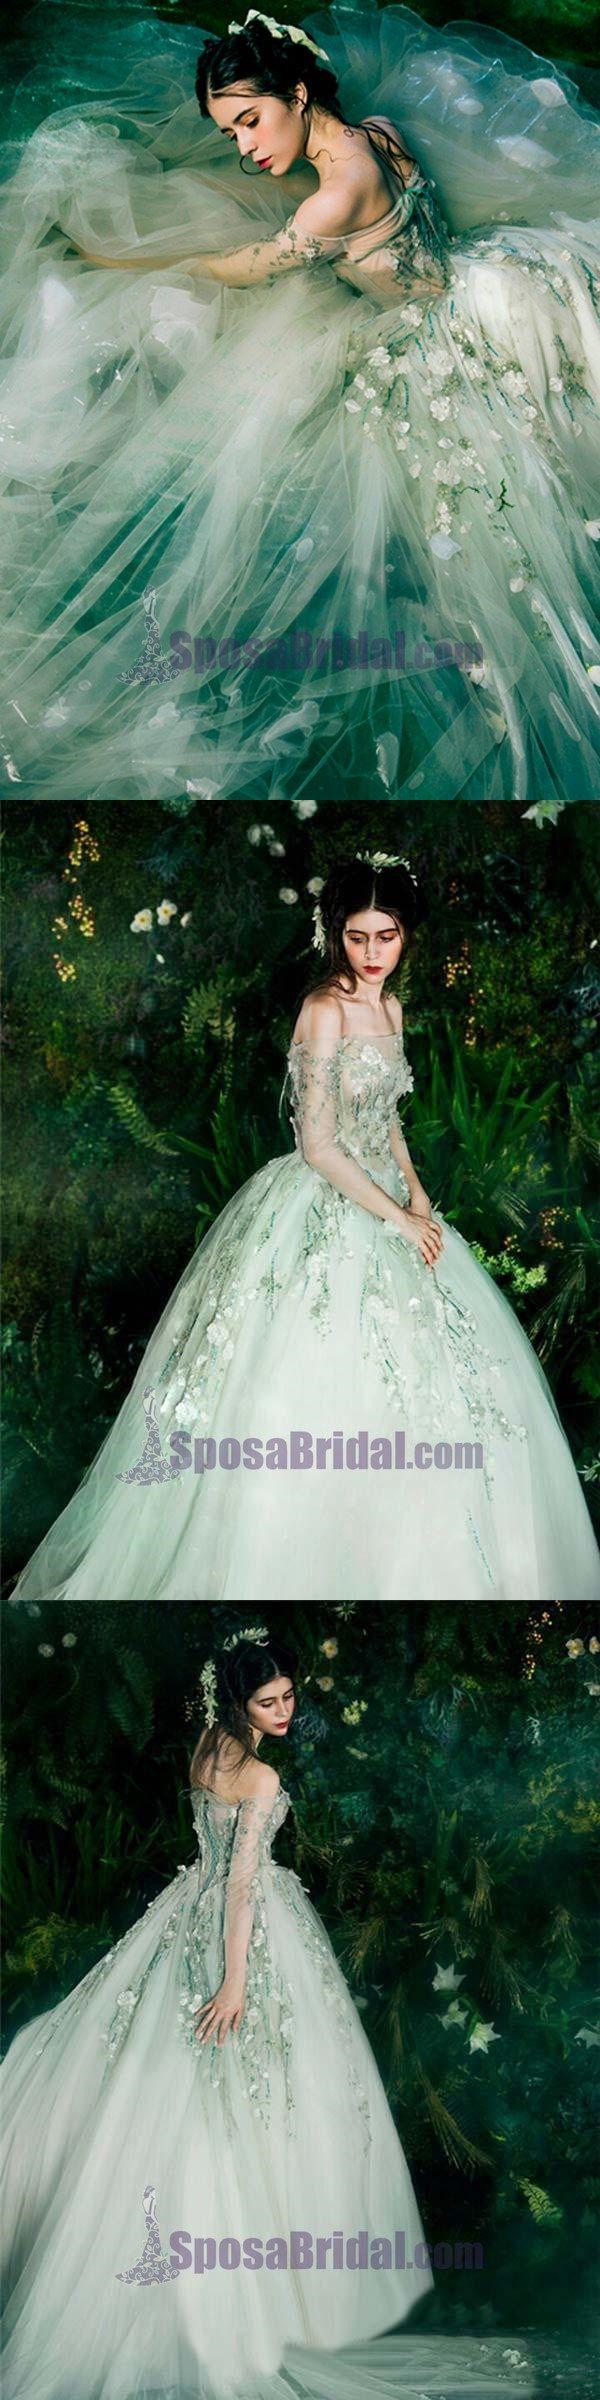 457 best vestidos images on Pinterest | Homecoming dresses, Low cut ...